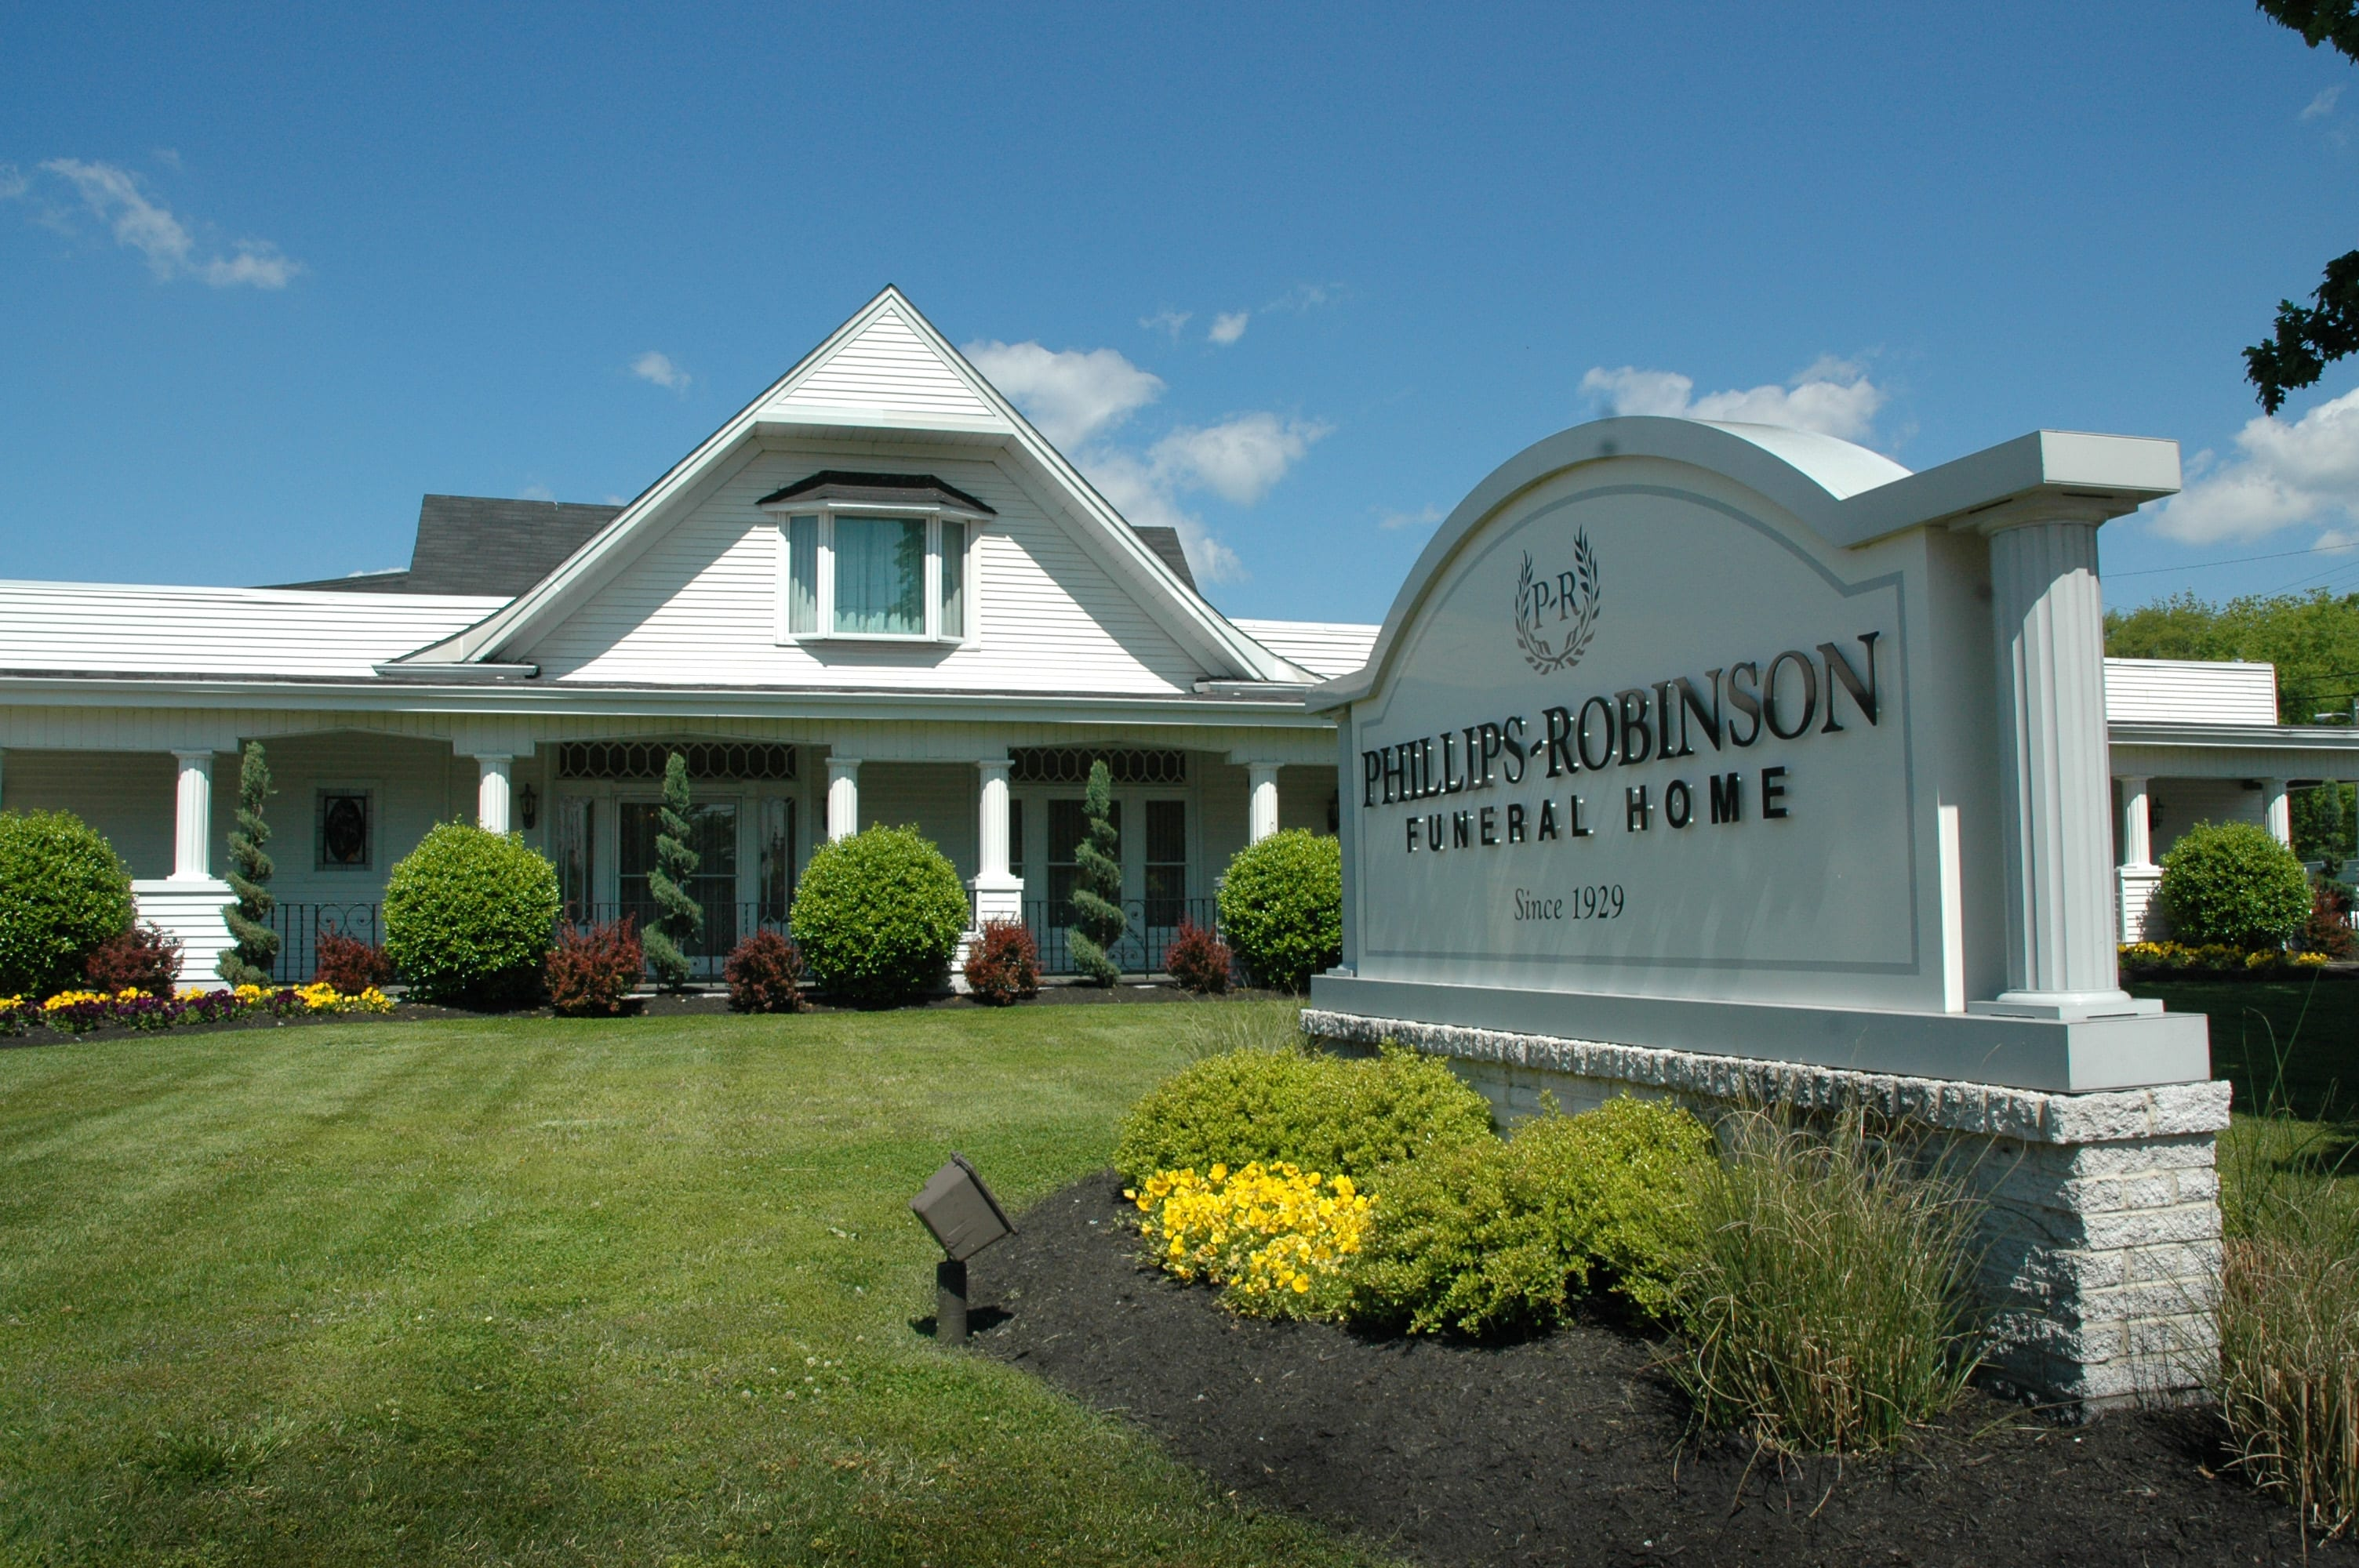 Phillips-Robinson Funeral Home - Nashville, TN